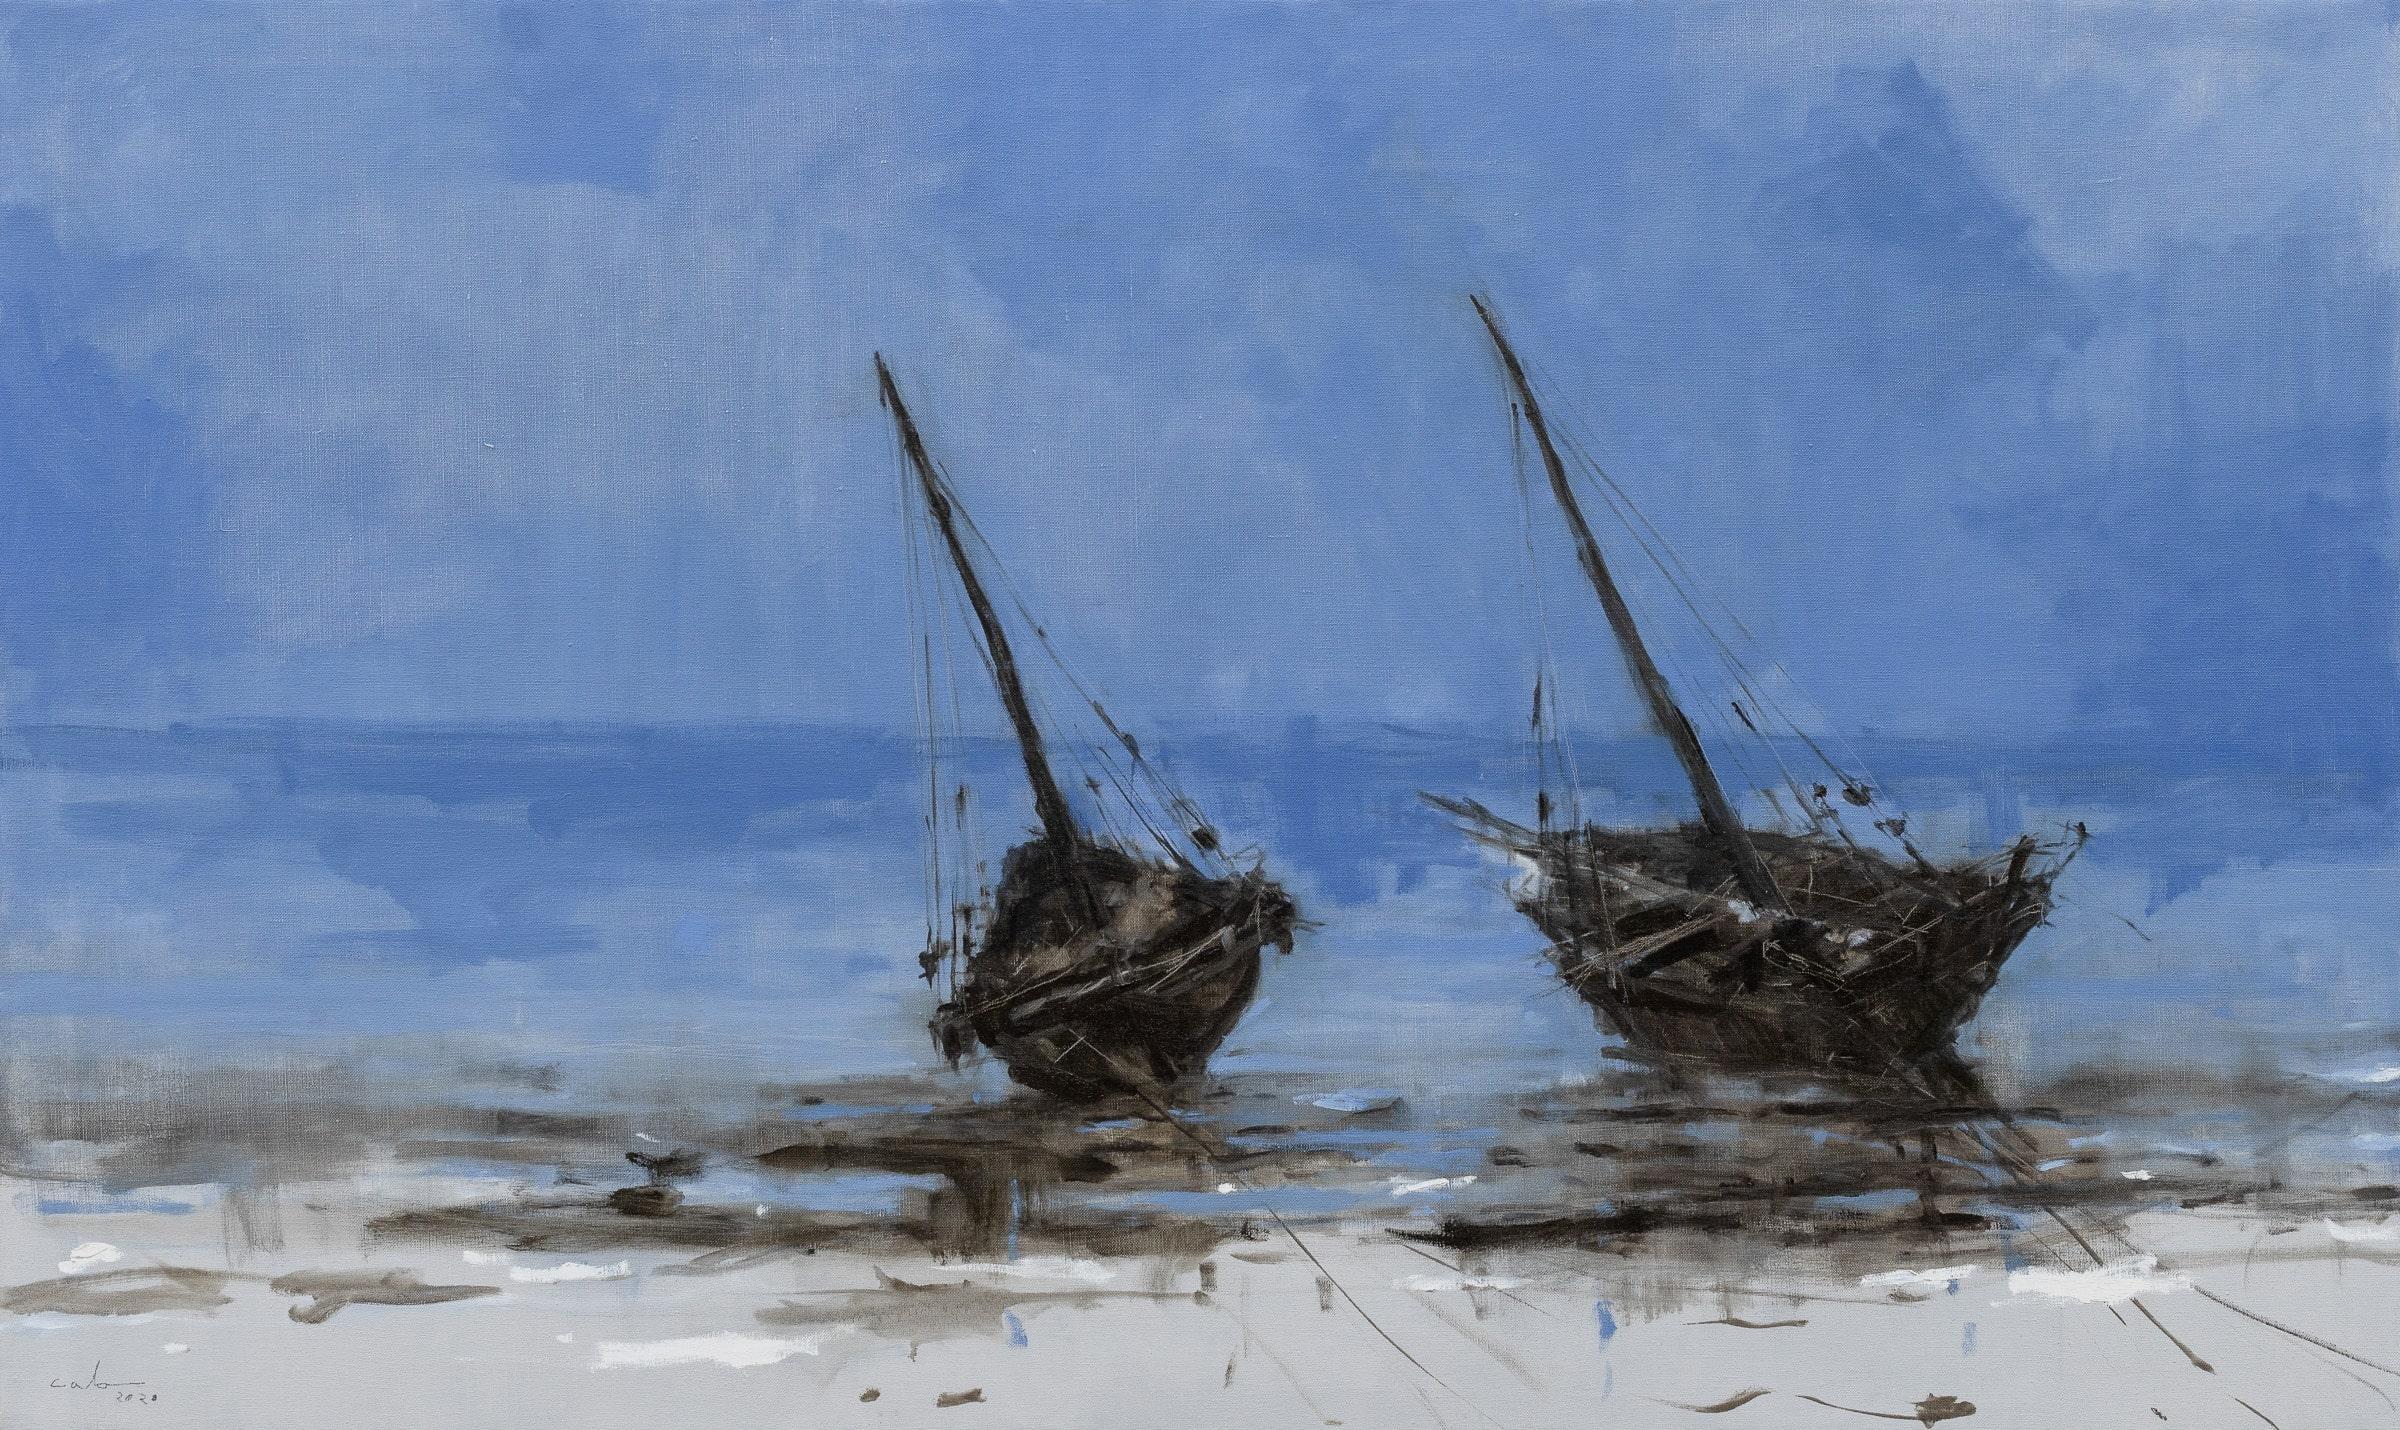 Coast of Bagamoyo #4 (Tanzania) - Landscape Painting